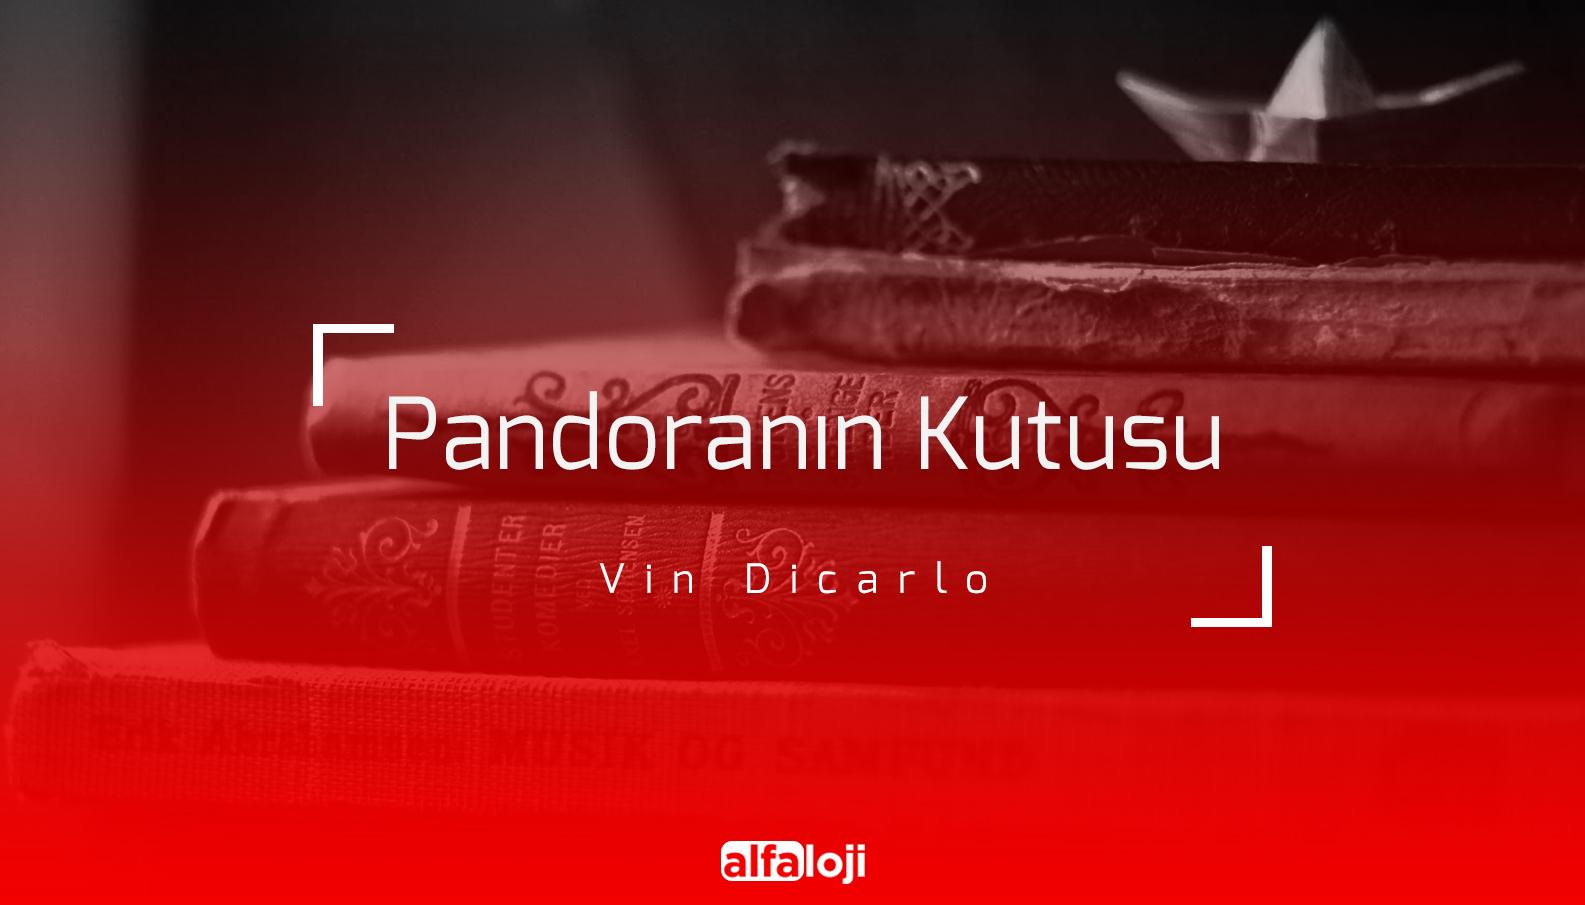 Vin Dicarlo - Pandora'nın Kutusu